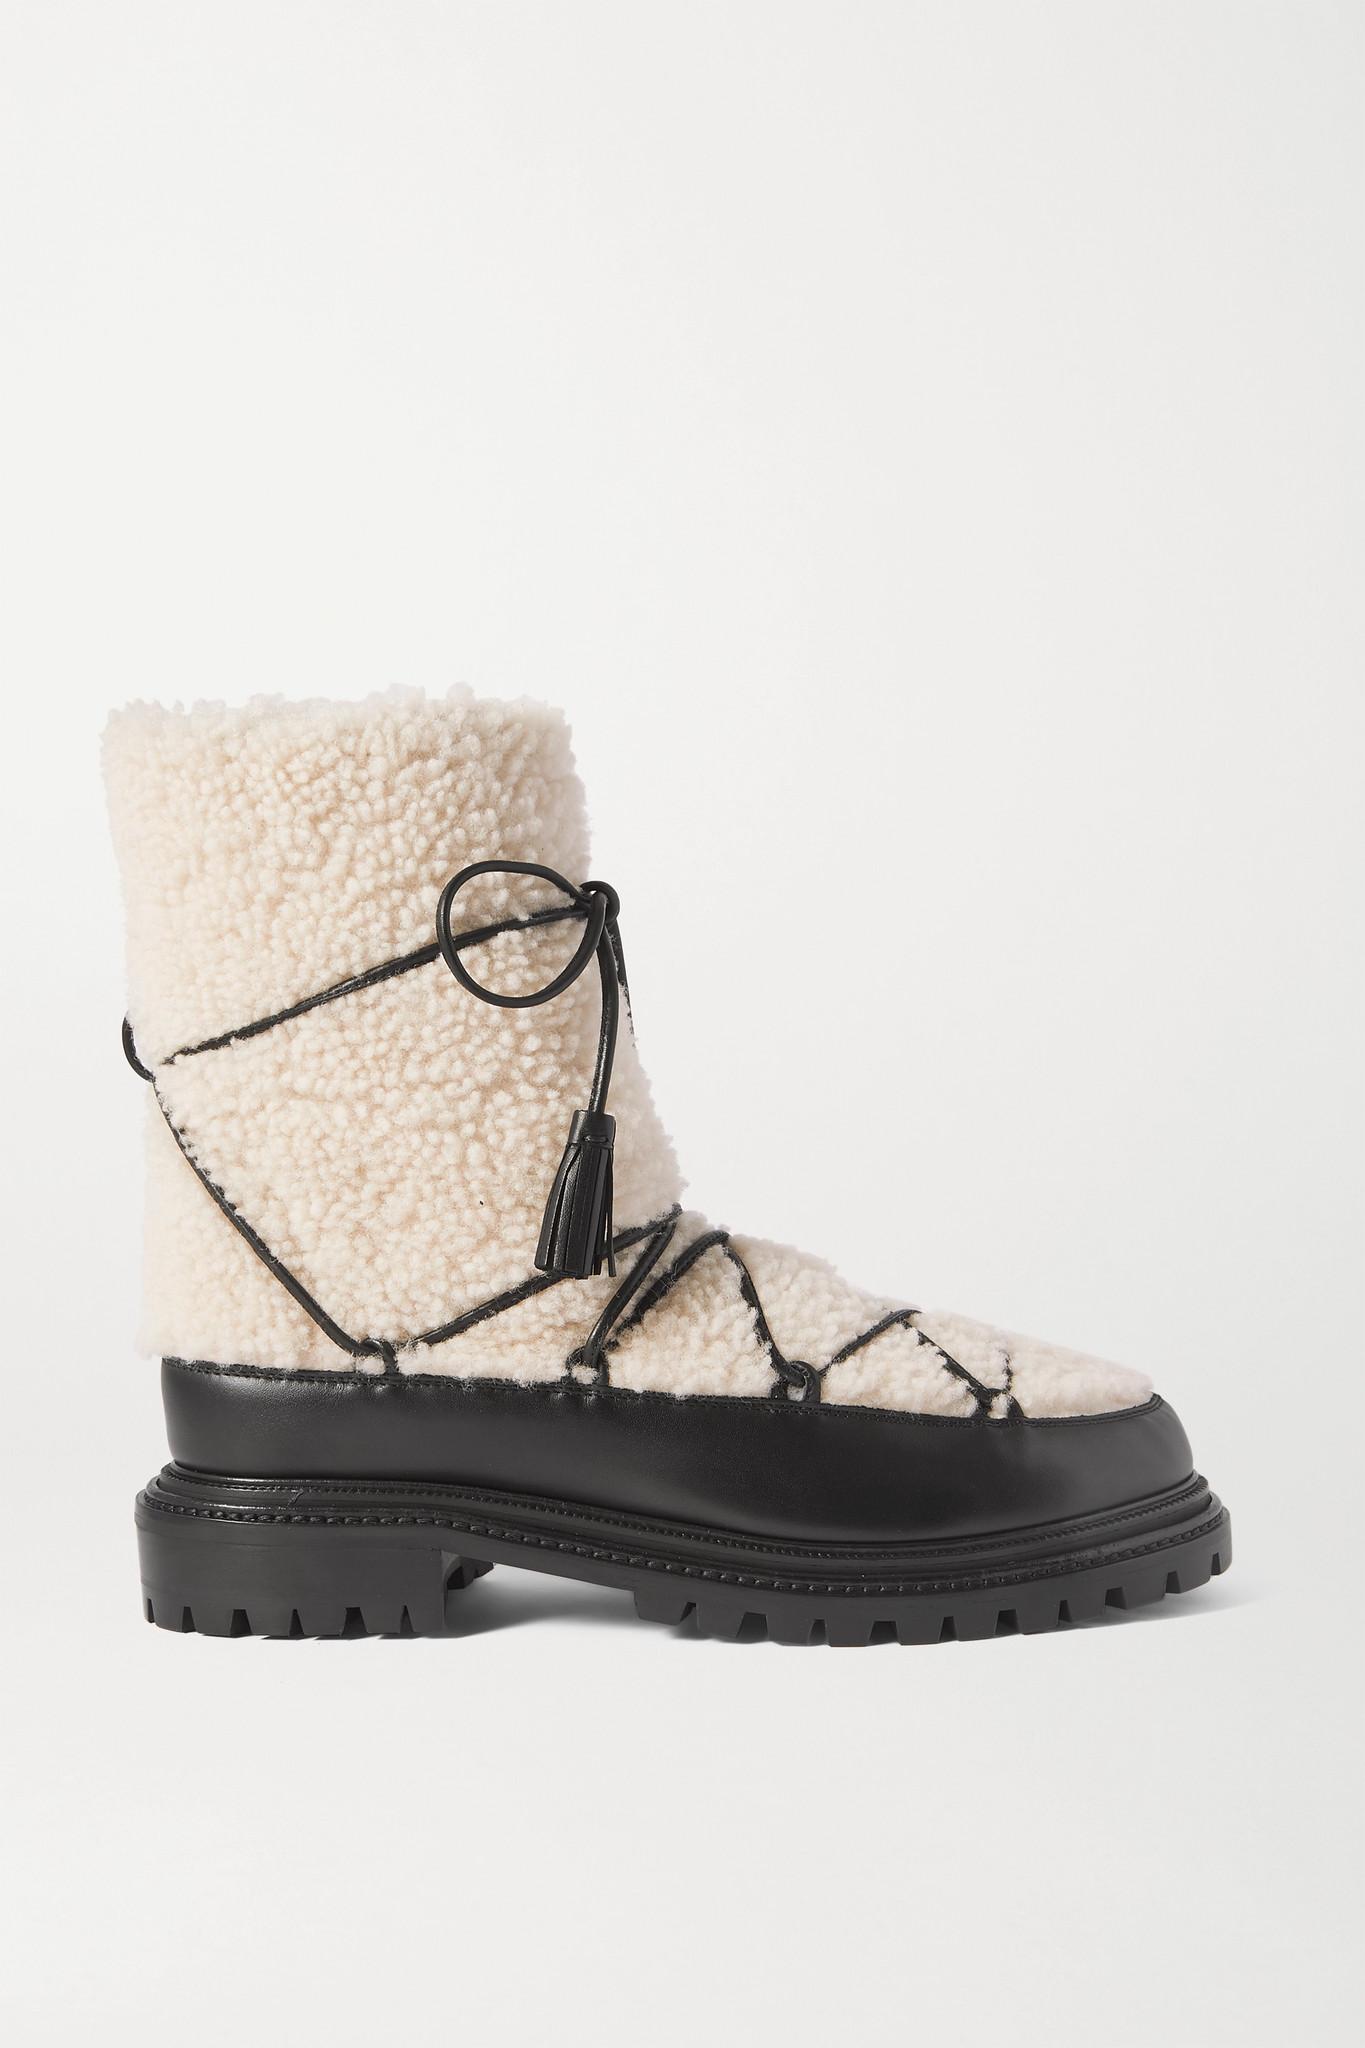 AQUAZZURA - Very Aspen 羊毛皮皮革踝靴 - 白色 - IT36